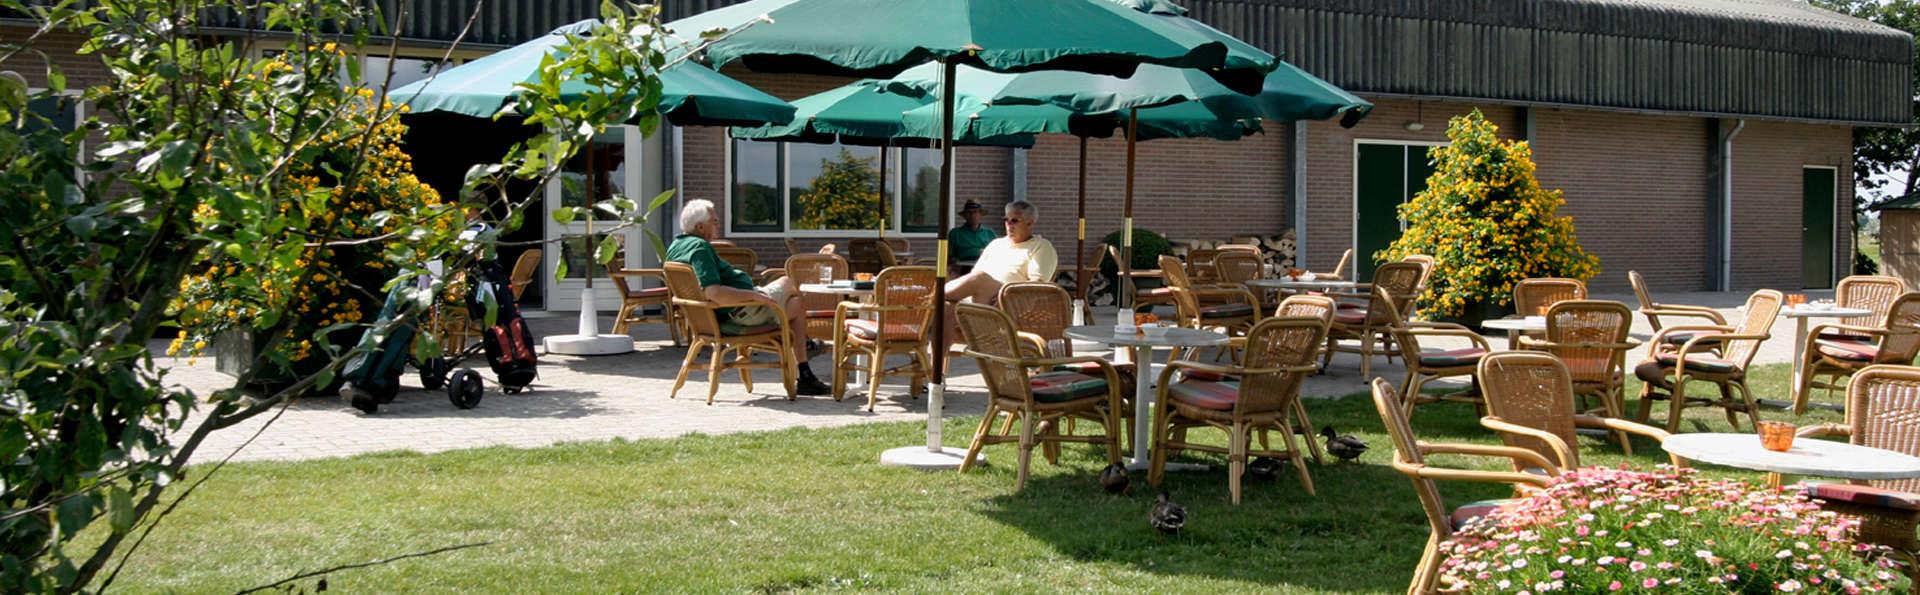 Princess Hotel Dorhout Mees - EDIT_garden.jpg